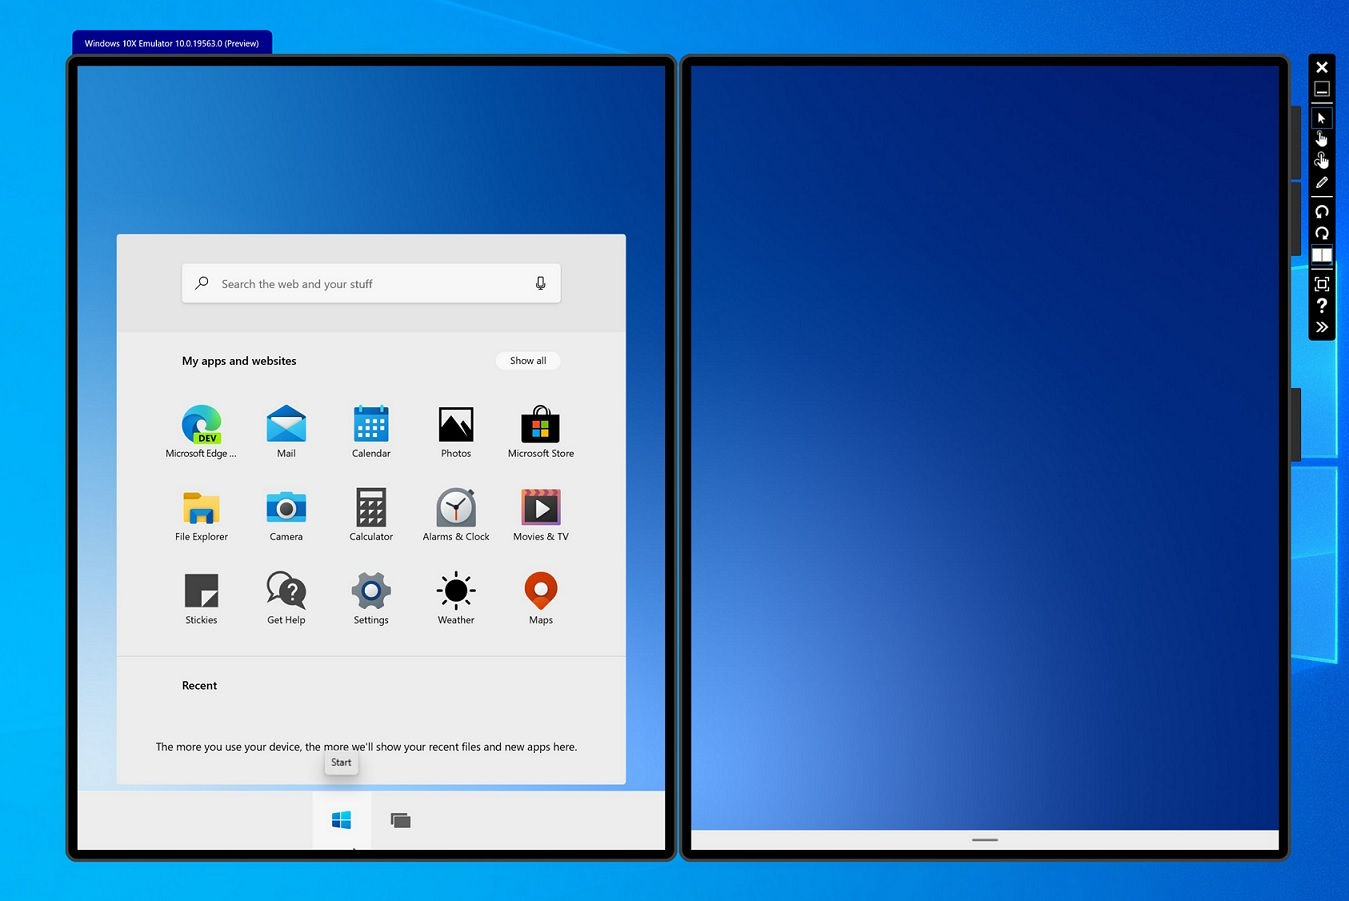 Menú de inicio creado por Microsoft para Windows 10X